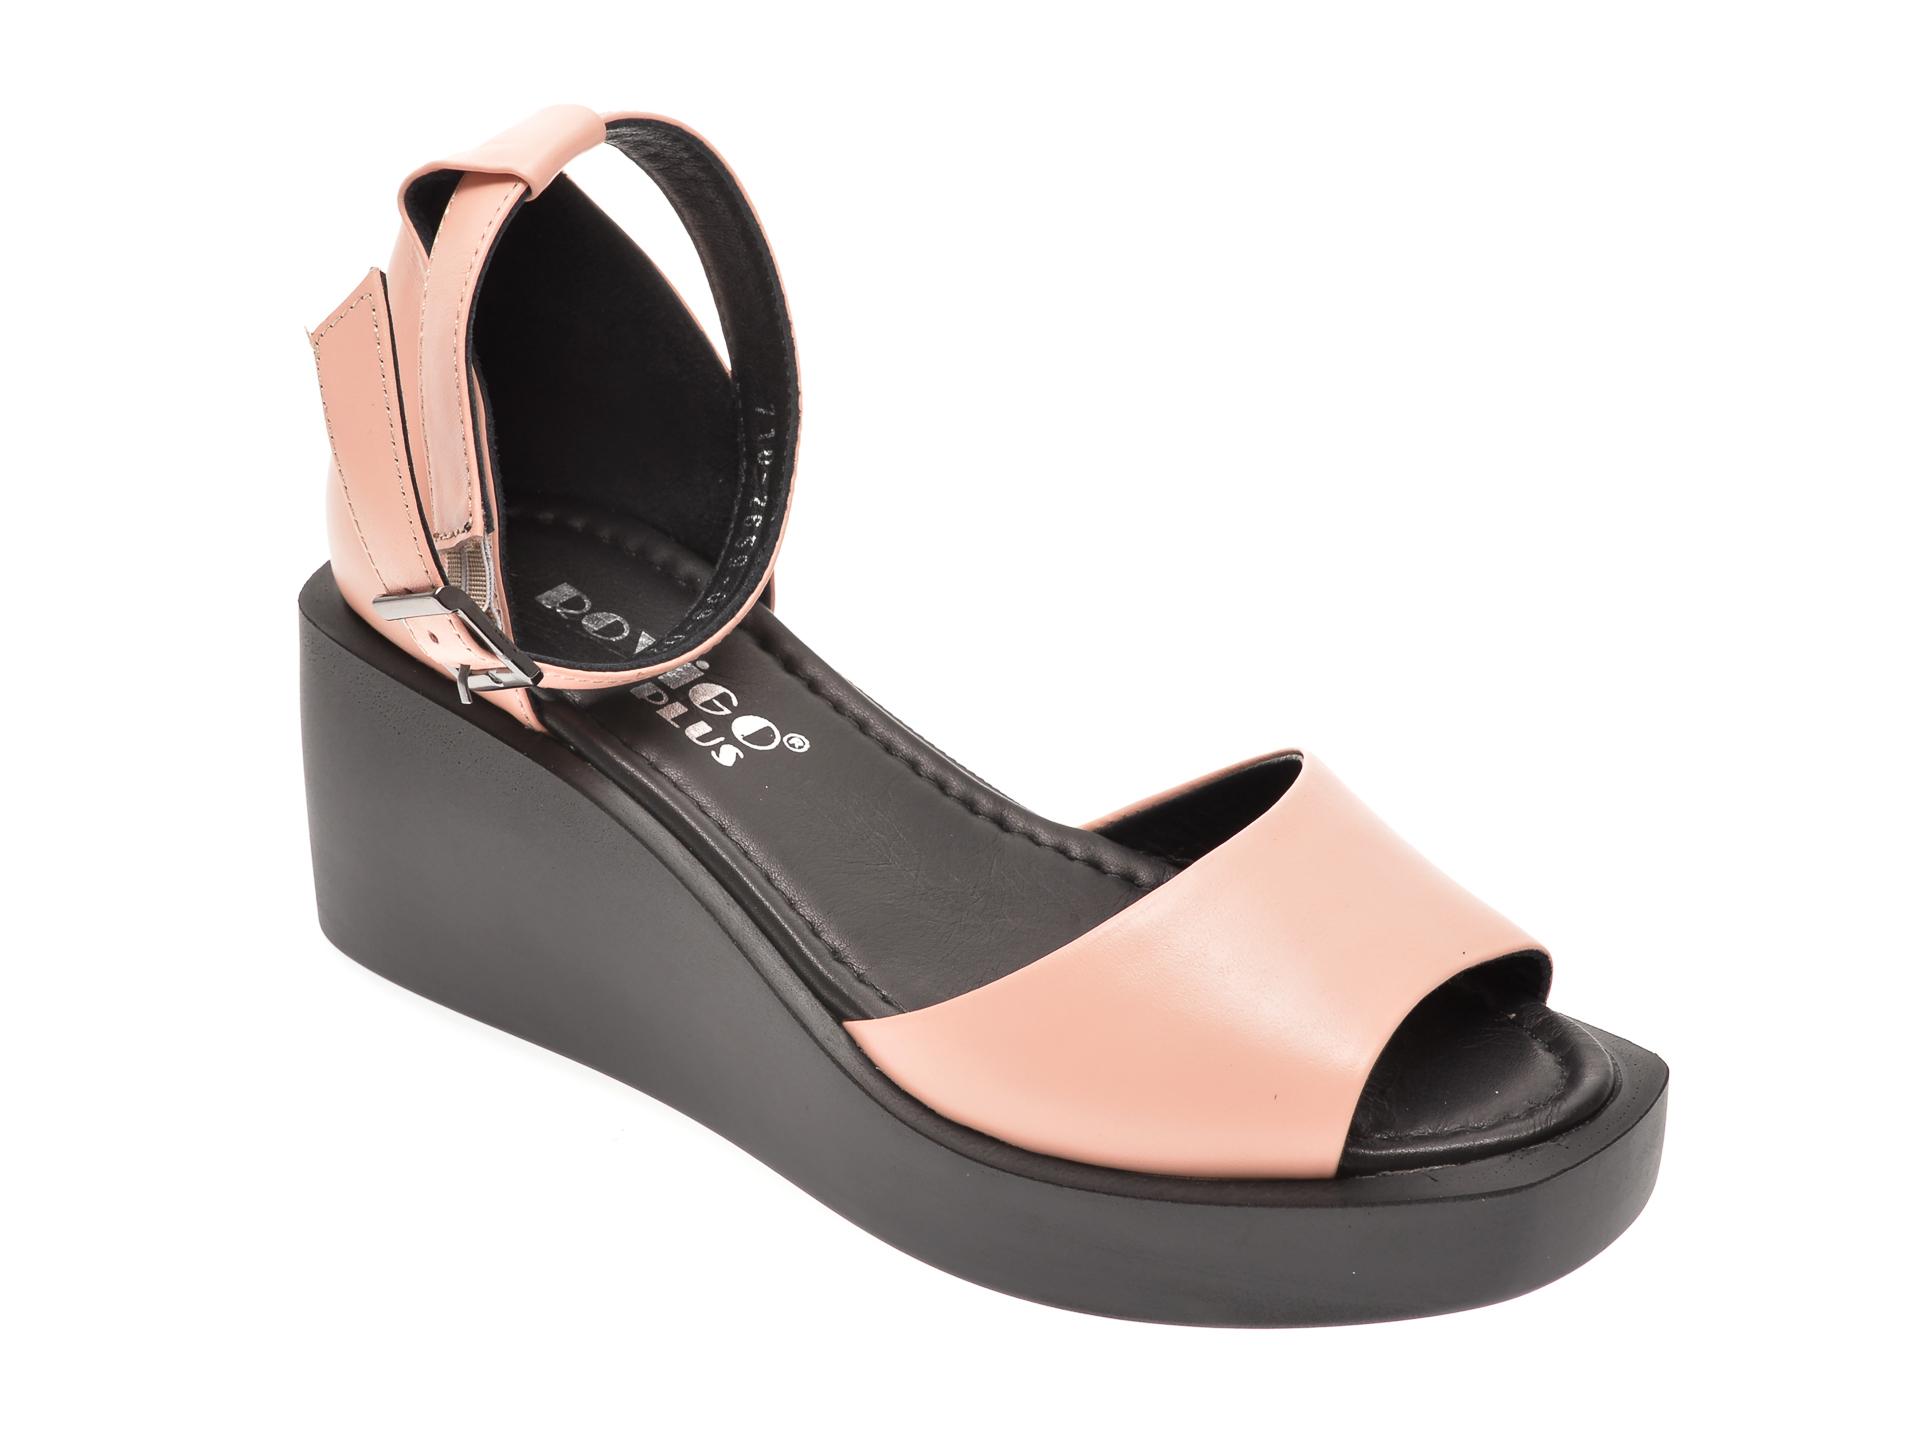 Sandale MISS LIZA roz, 1182659, din piele naturala